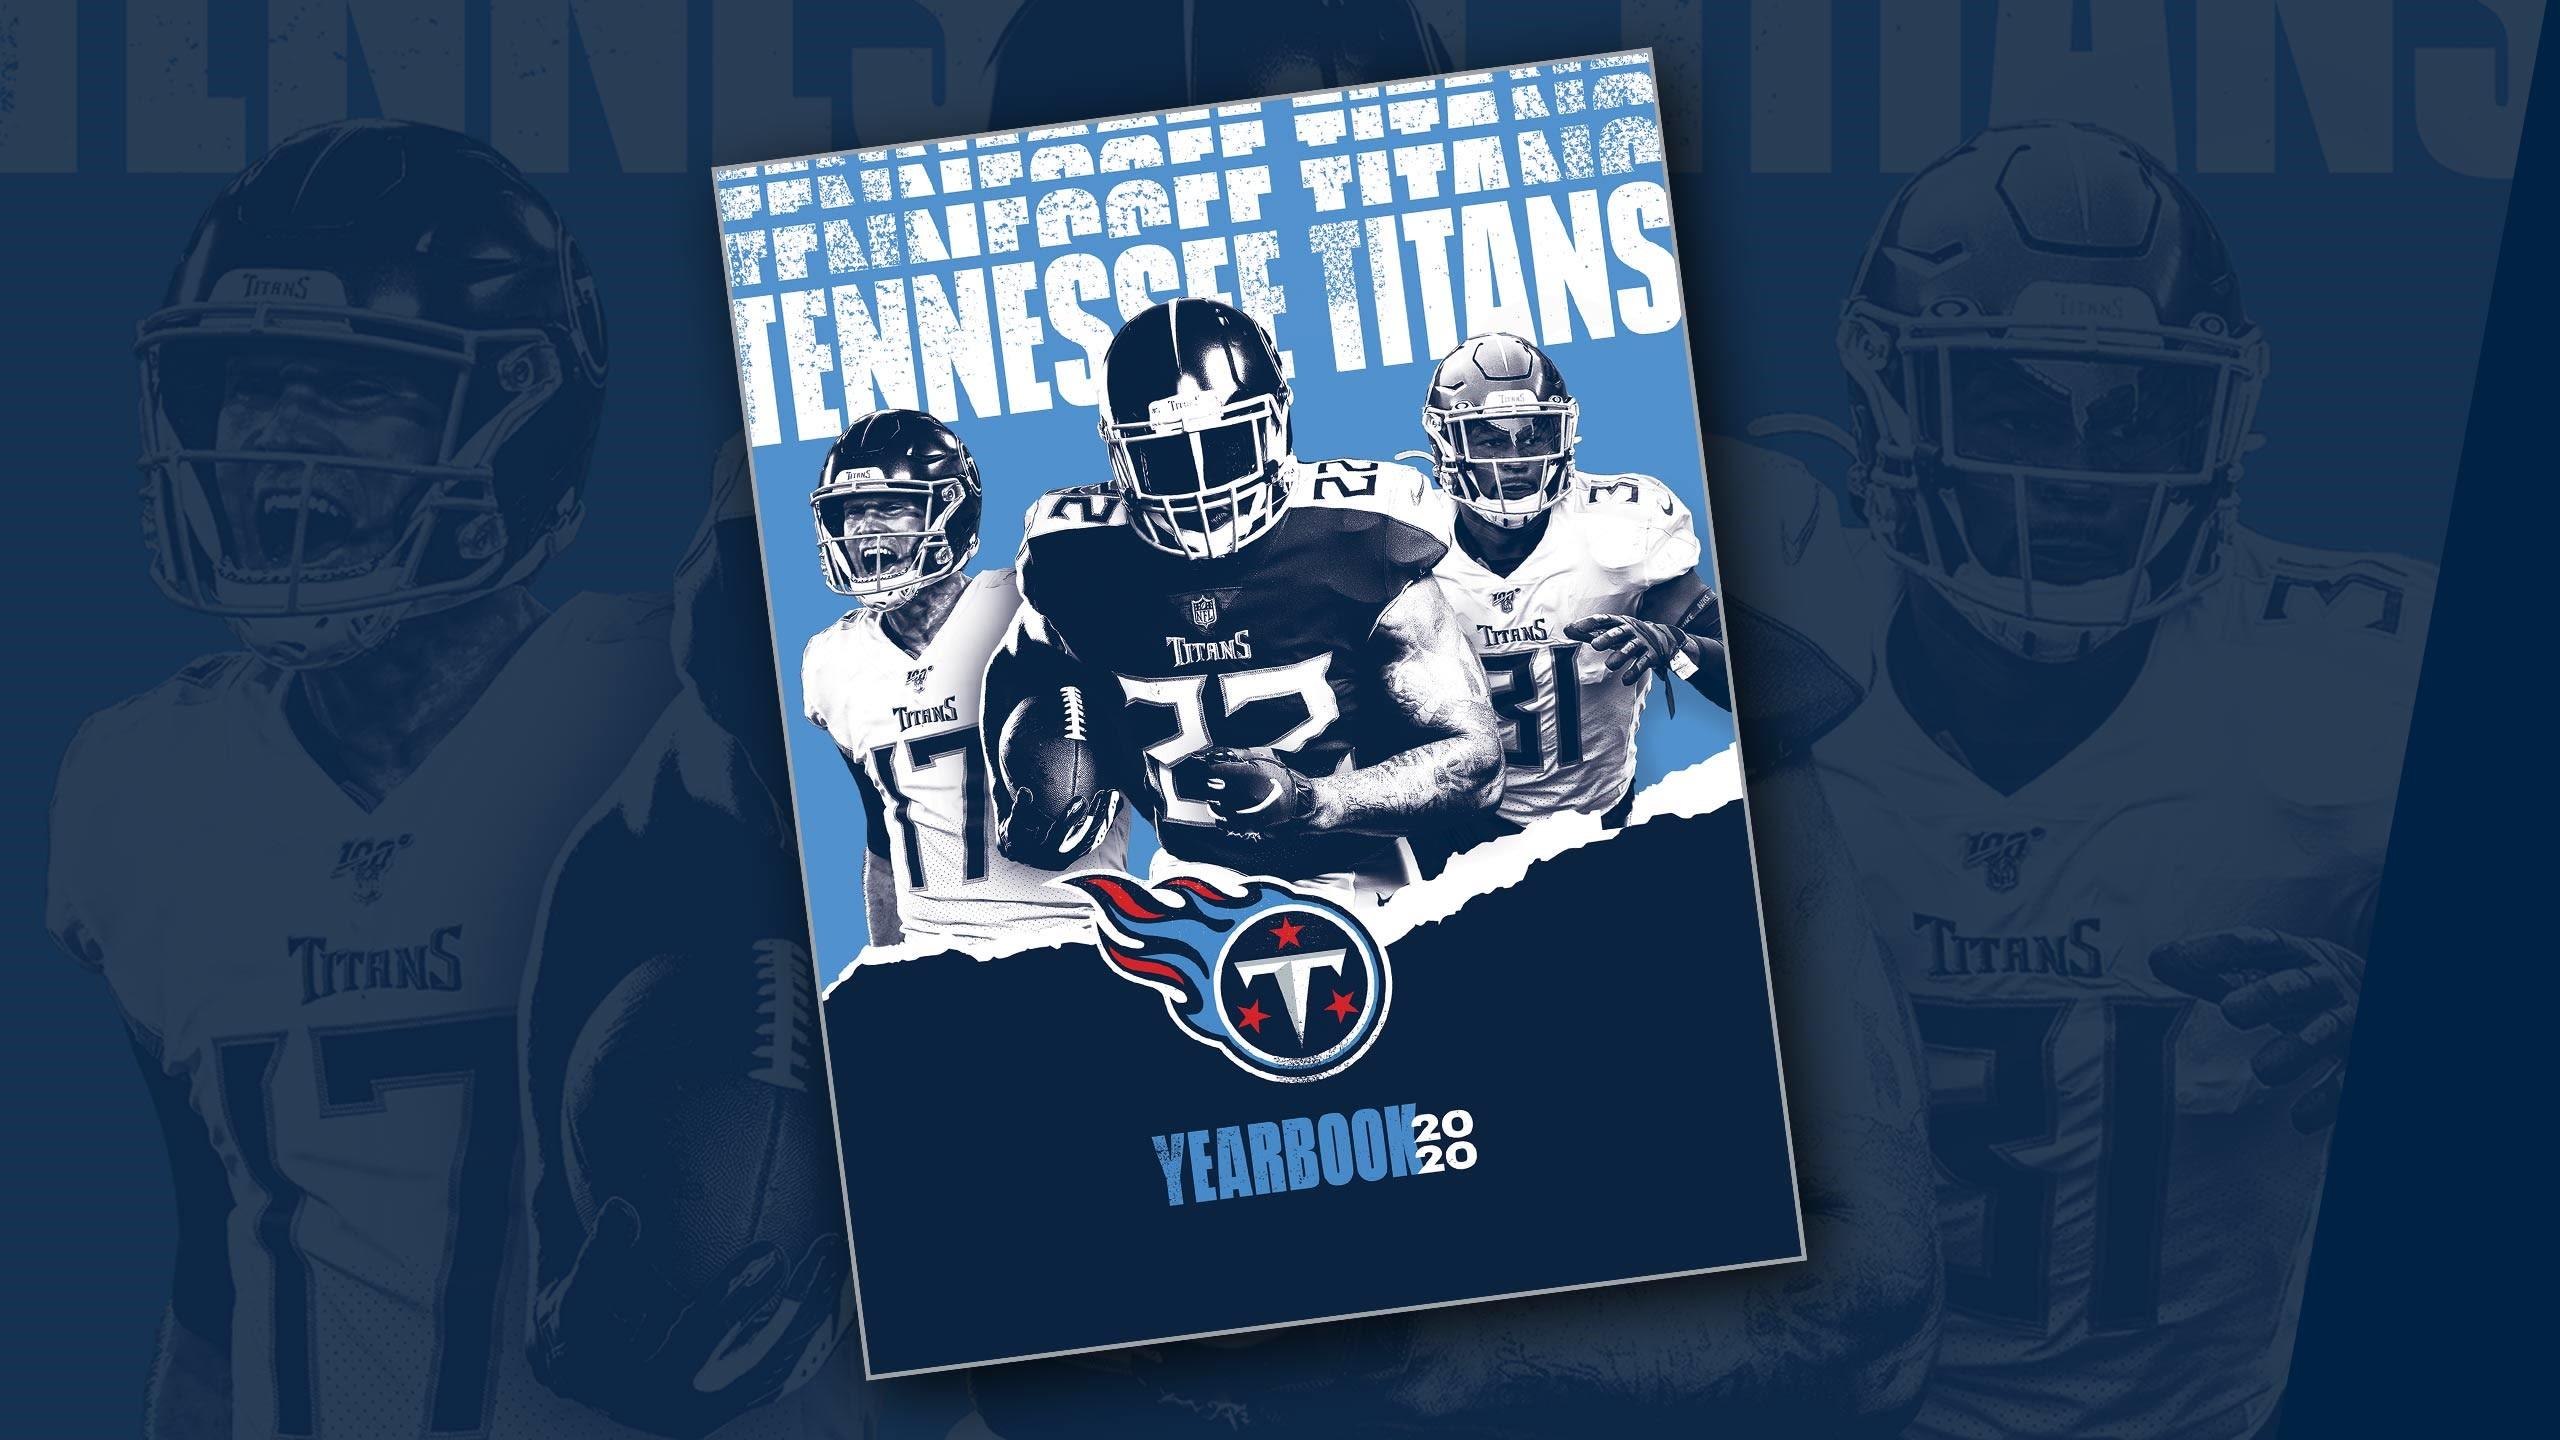 2020 Titans Yearbook